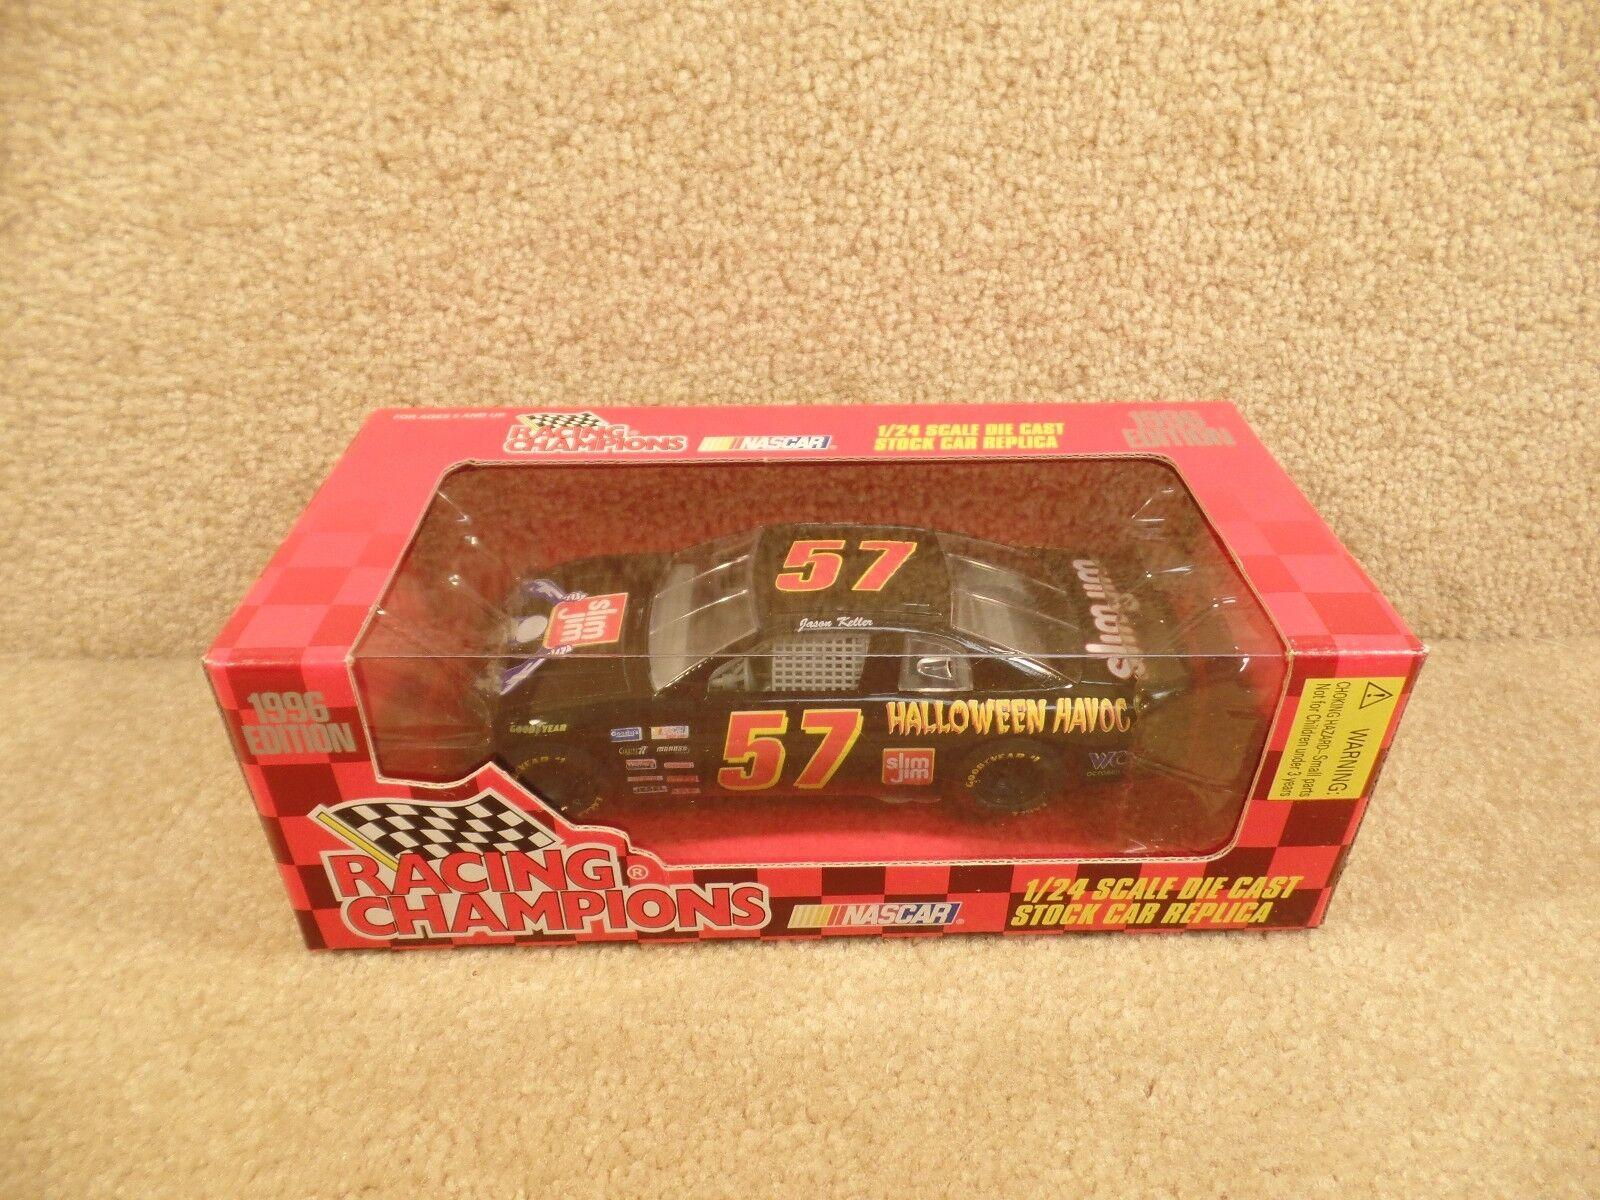 New 1996 Racing Champions 1 24 NASCAR Jason Keller Slim Jim Halloween Havoc